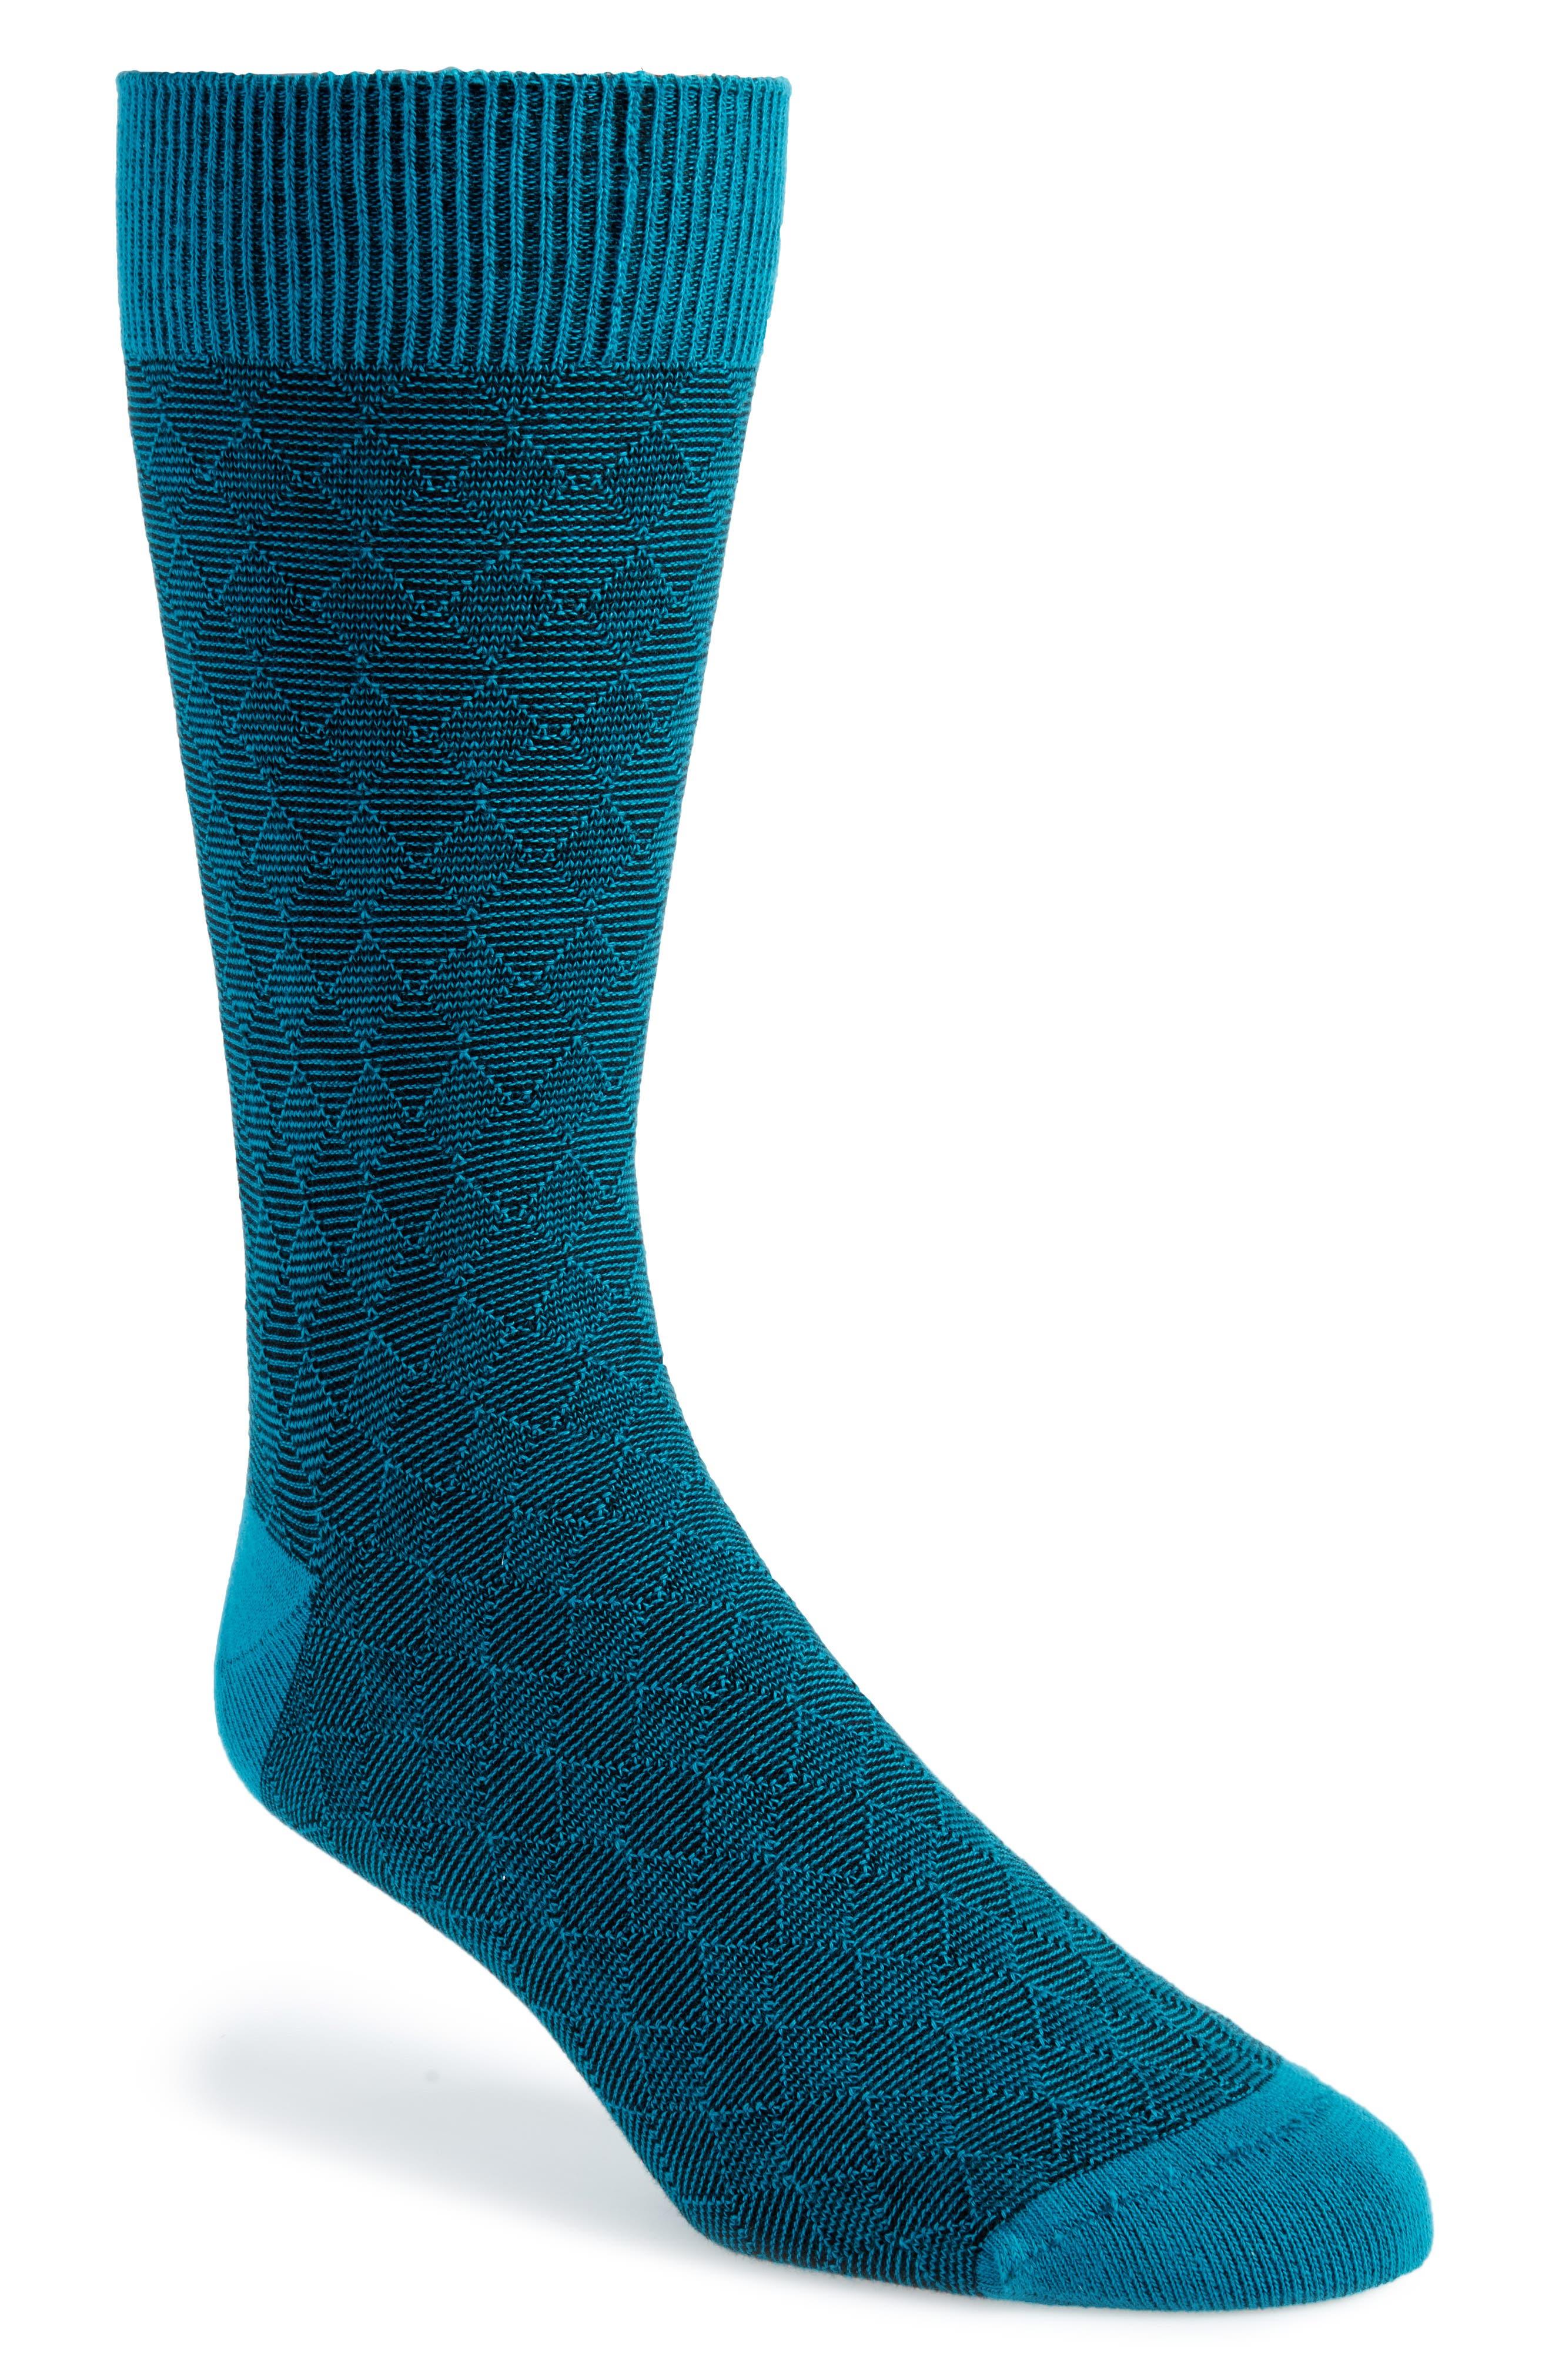 Diamond Textured Socks,                         Main,                         color,